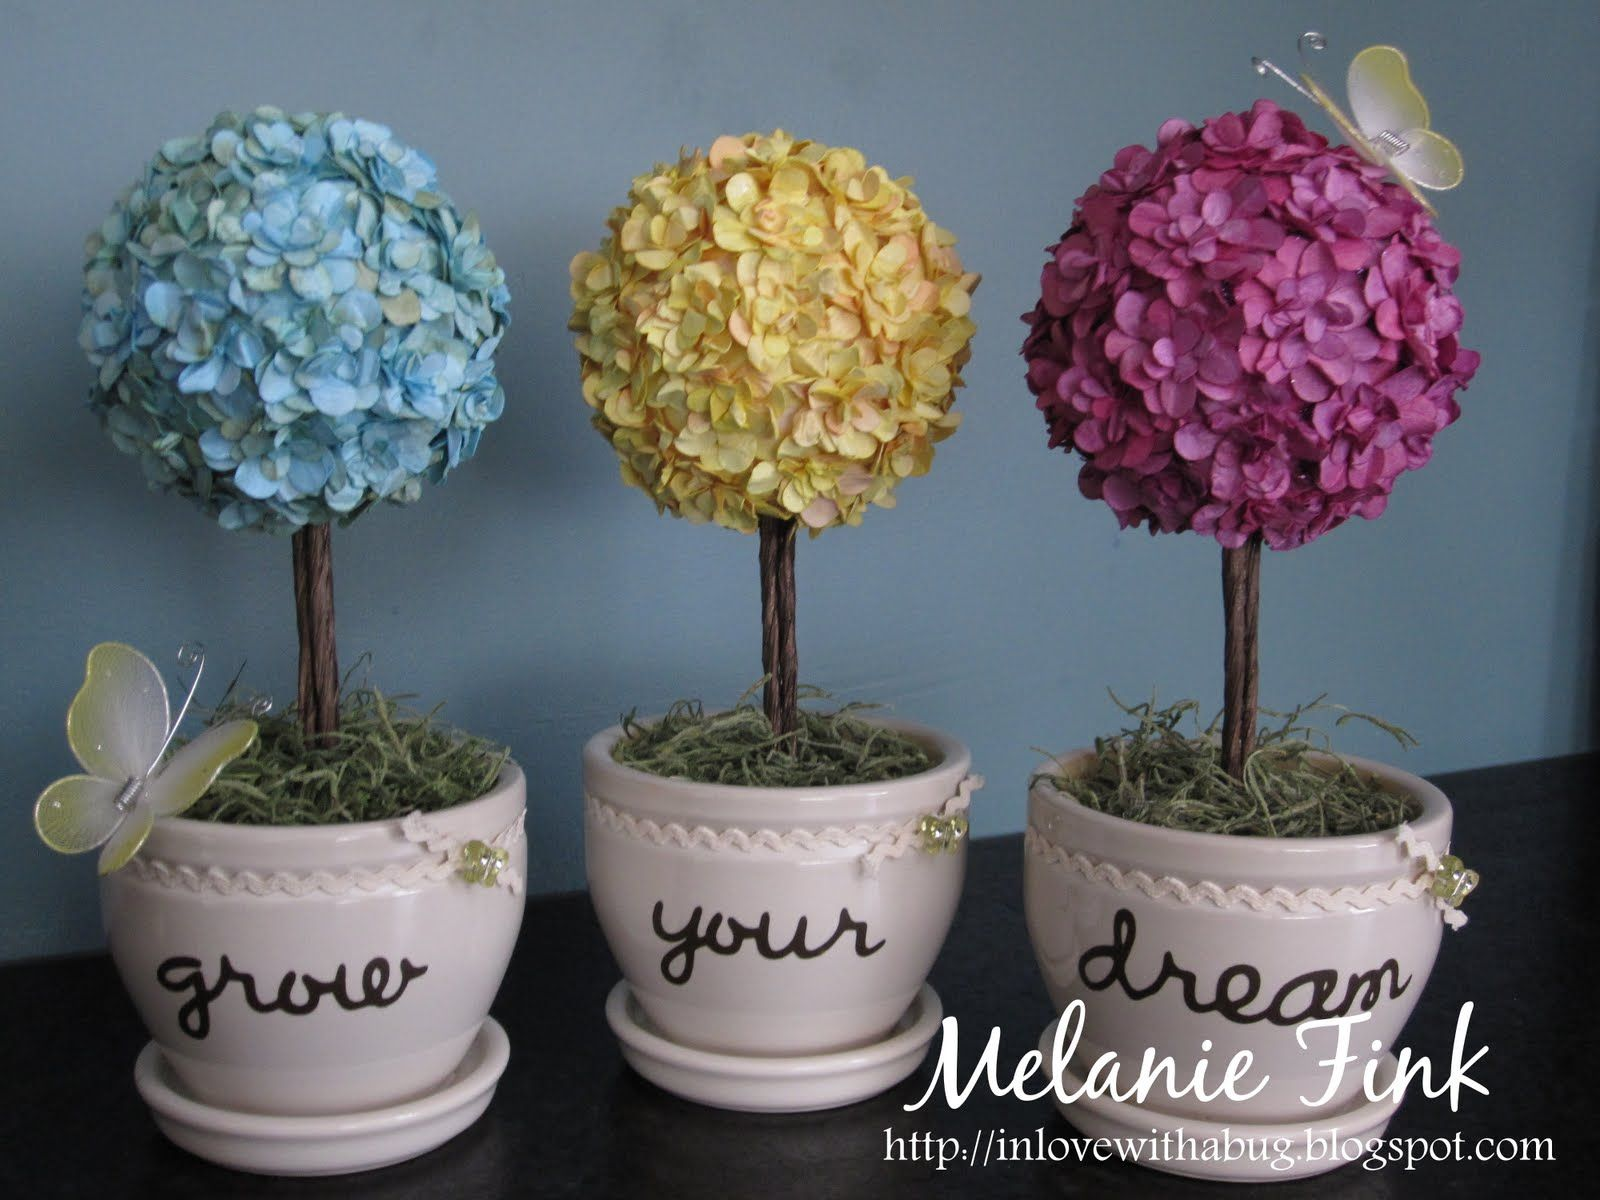 Fabulous flower topiaries made by Melanie